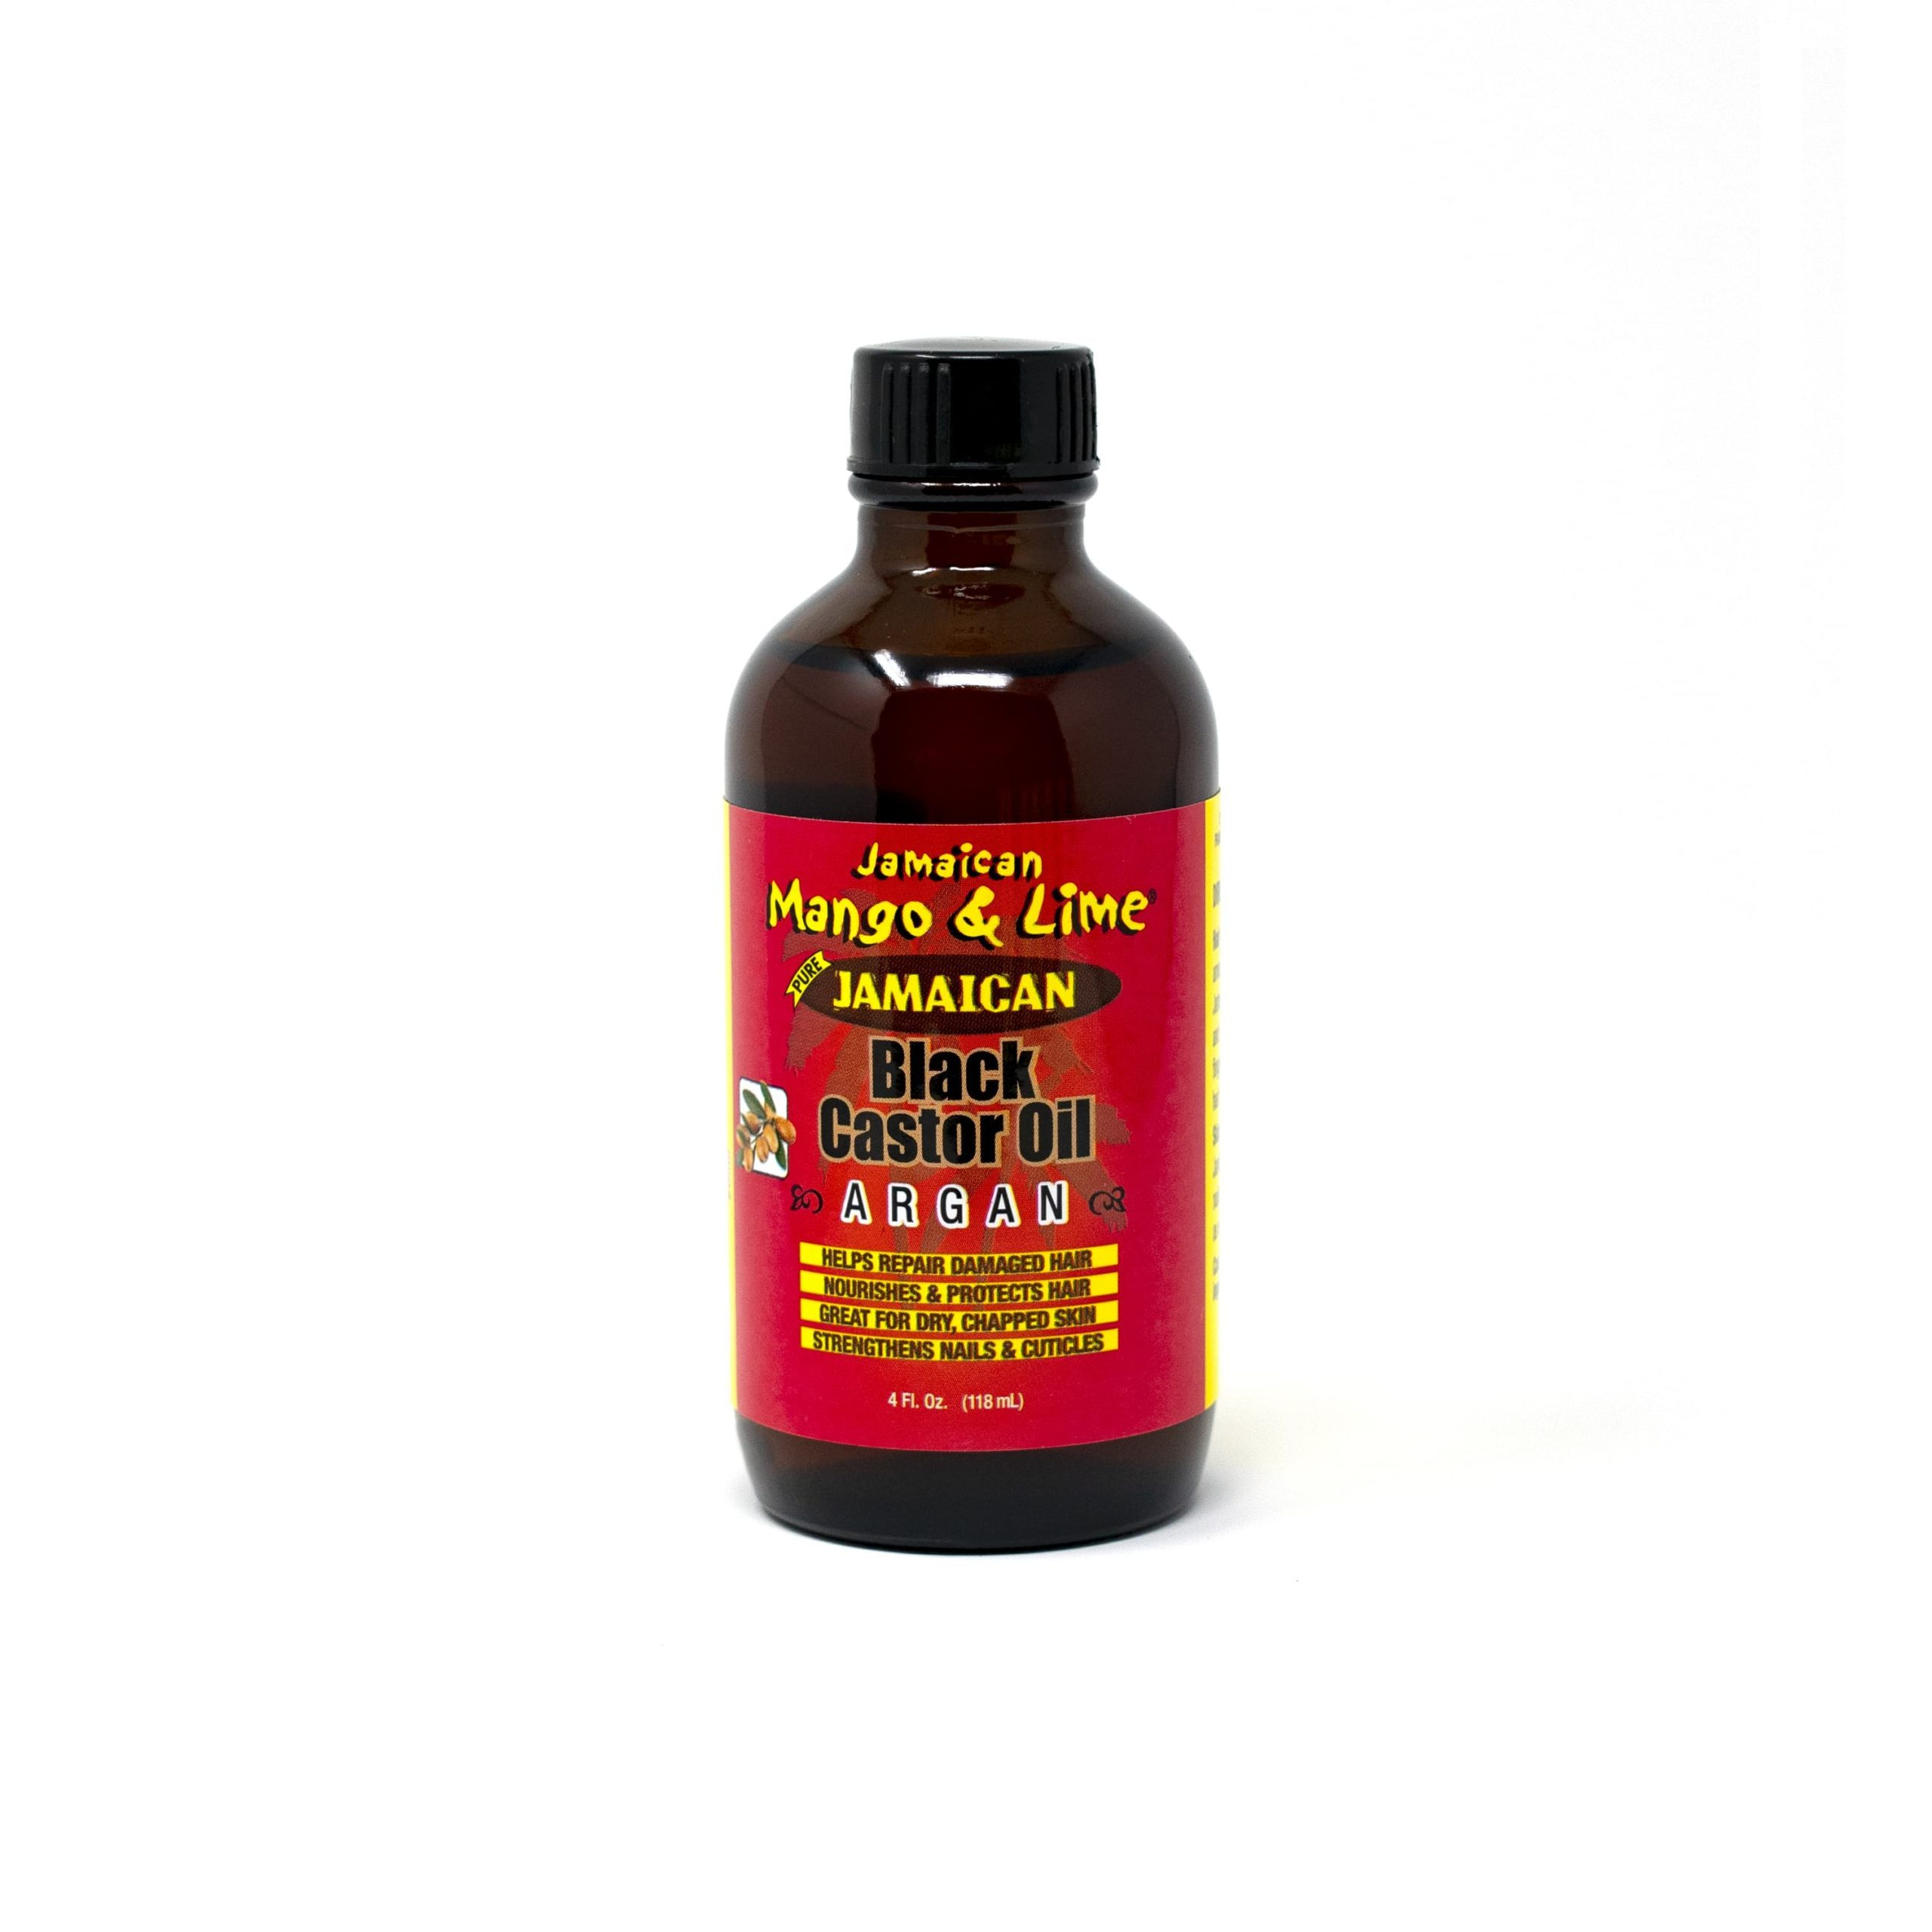 JML-Black-Castor-Oil-Argan-4oz-scaled (1)